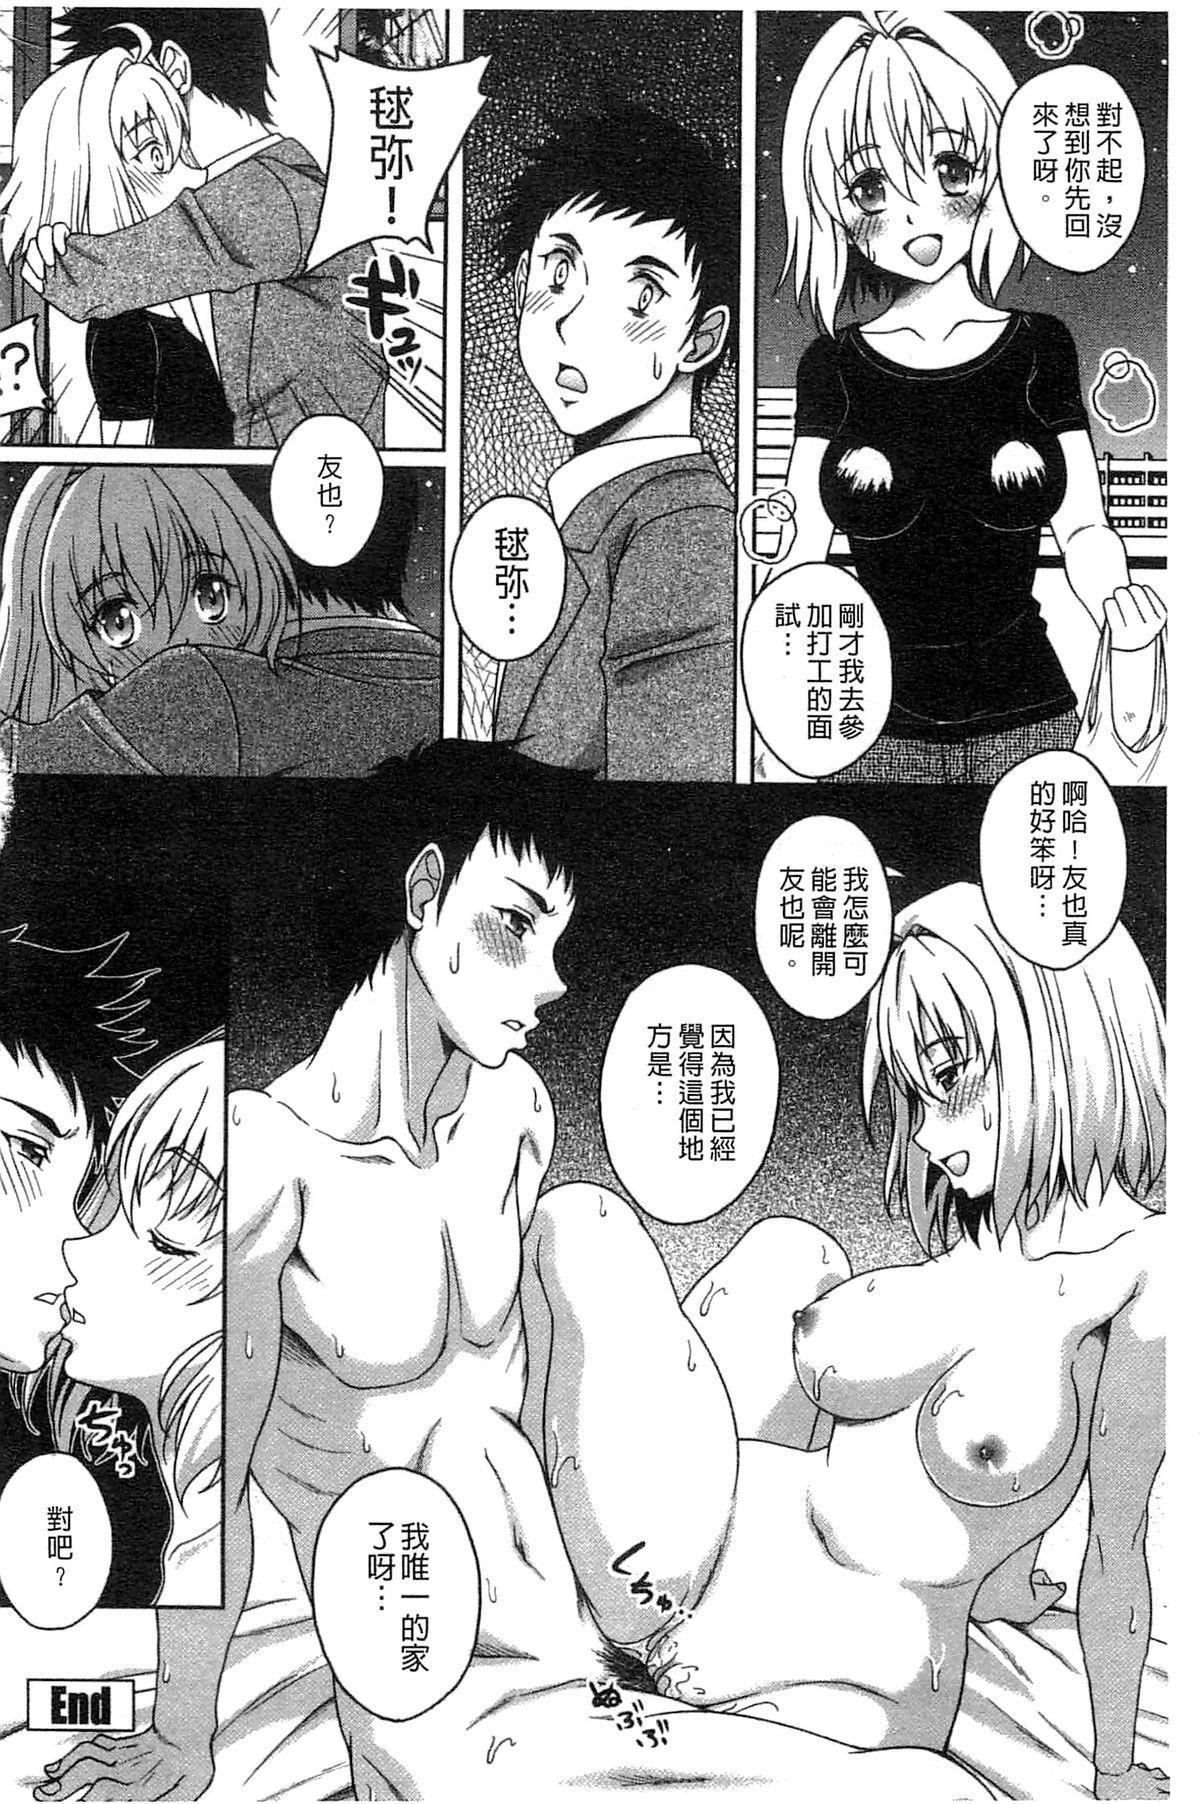 Hajimete nan da kara 202